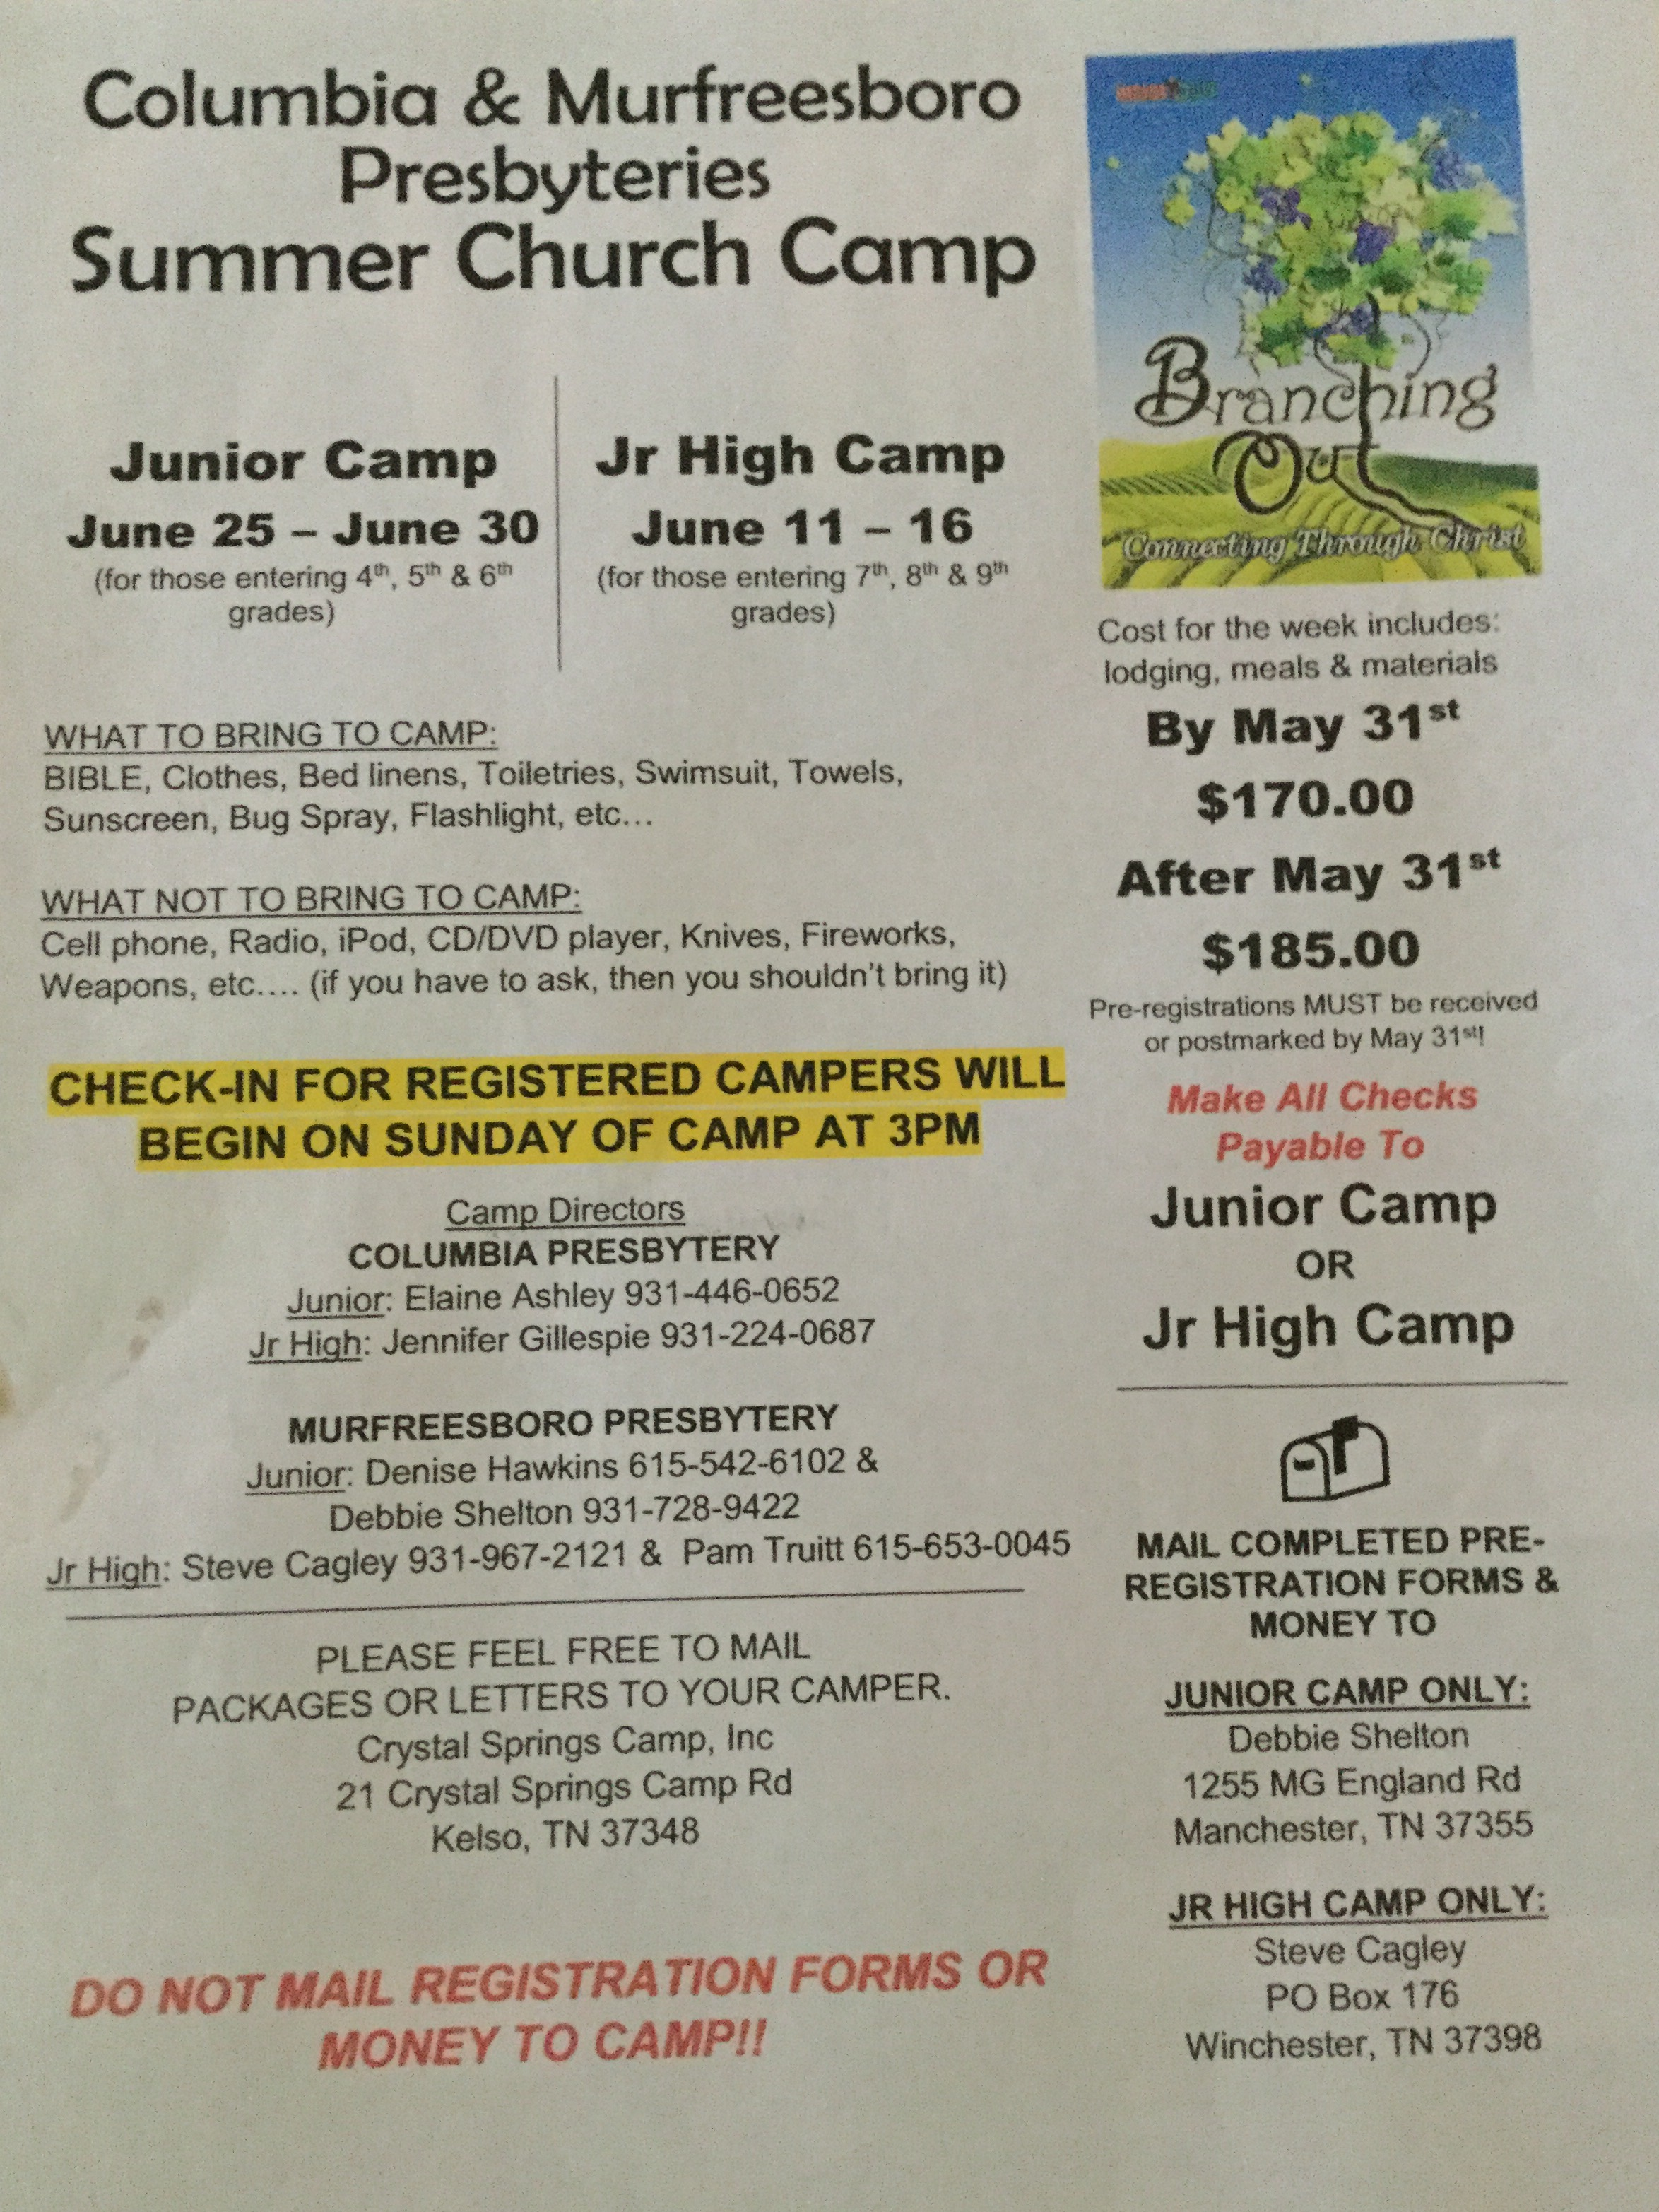 Junior and Junior High Camps